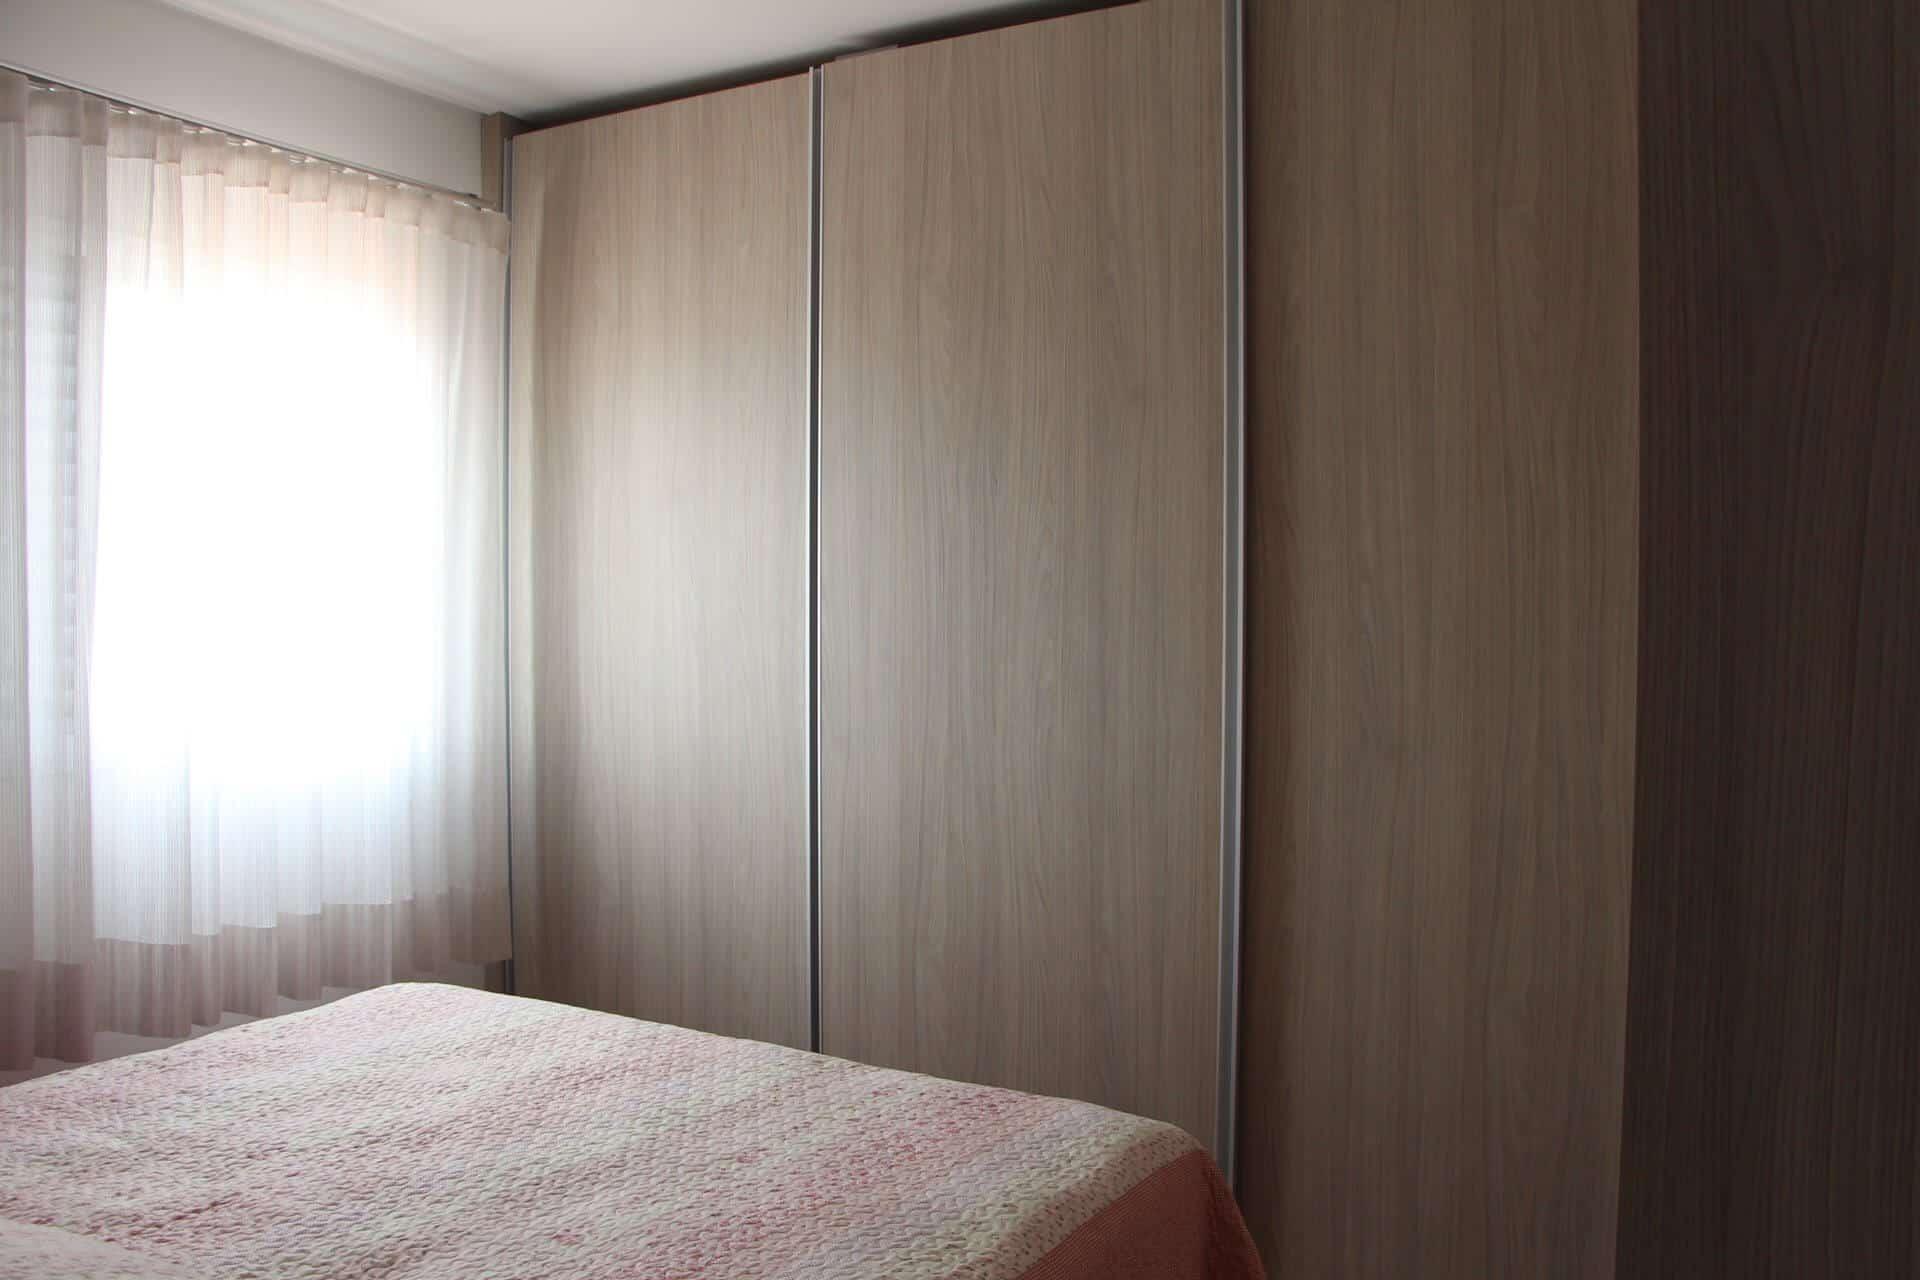 dormitorio-planejado_moveis-sob-medida-galeria-80